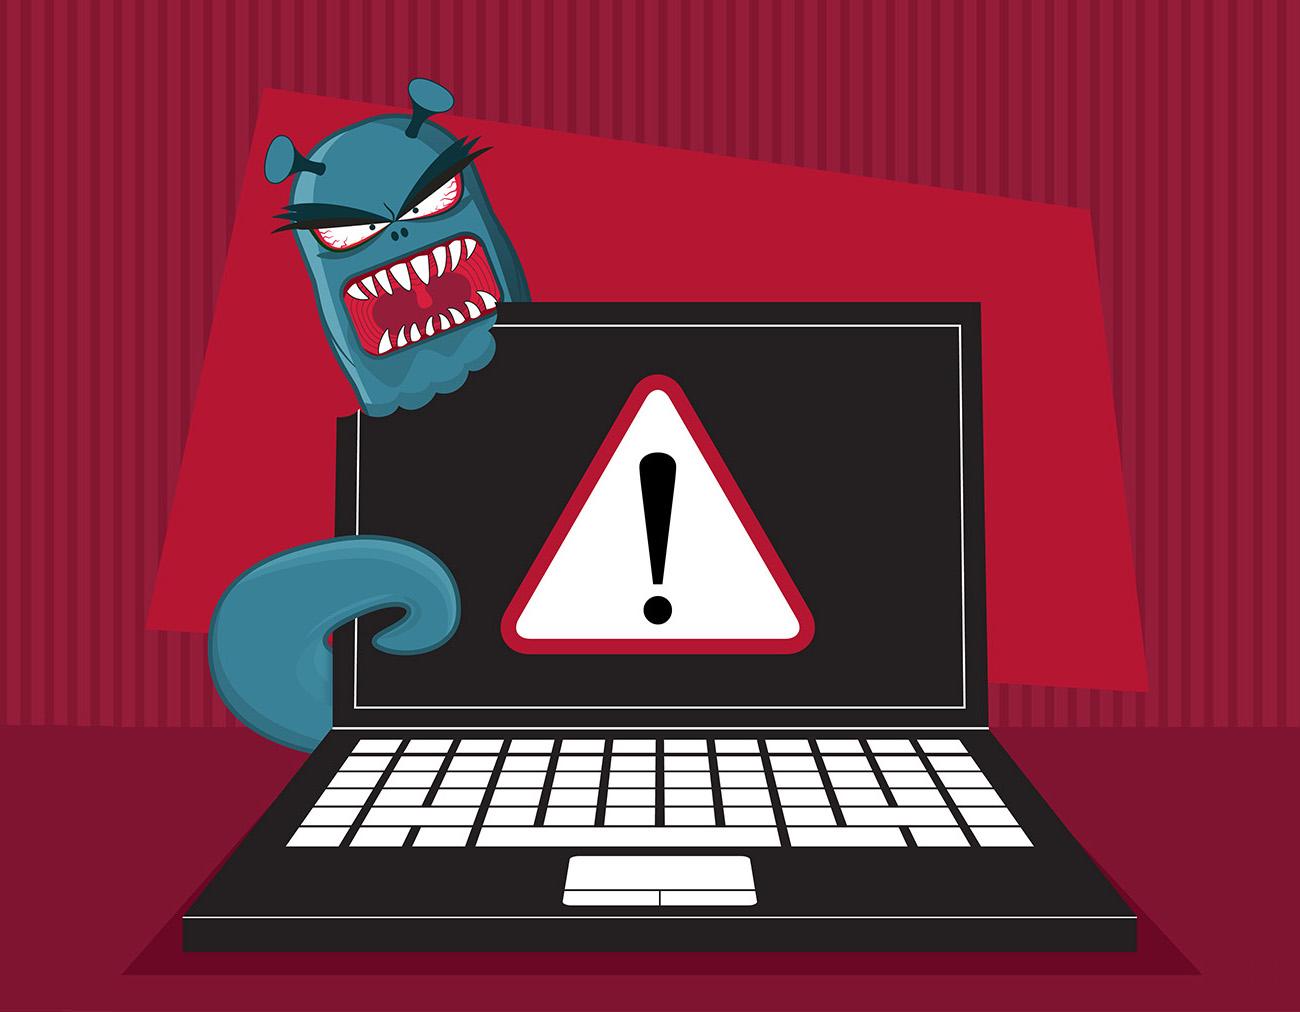 Cybersecurity PC alert